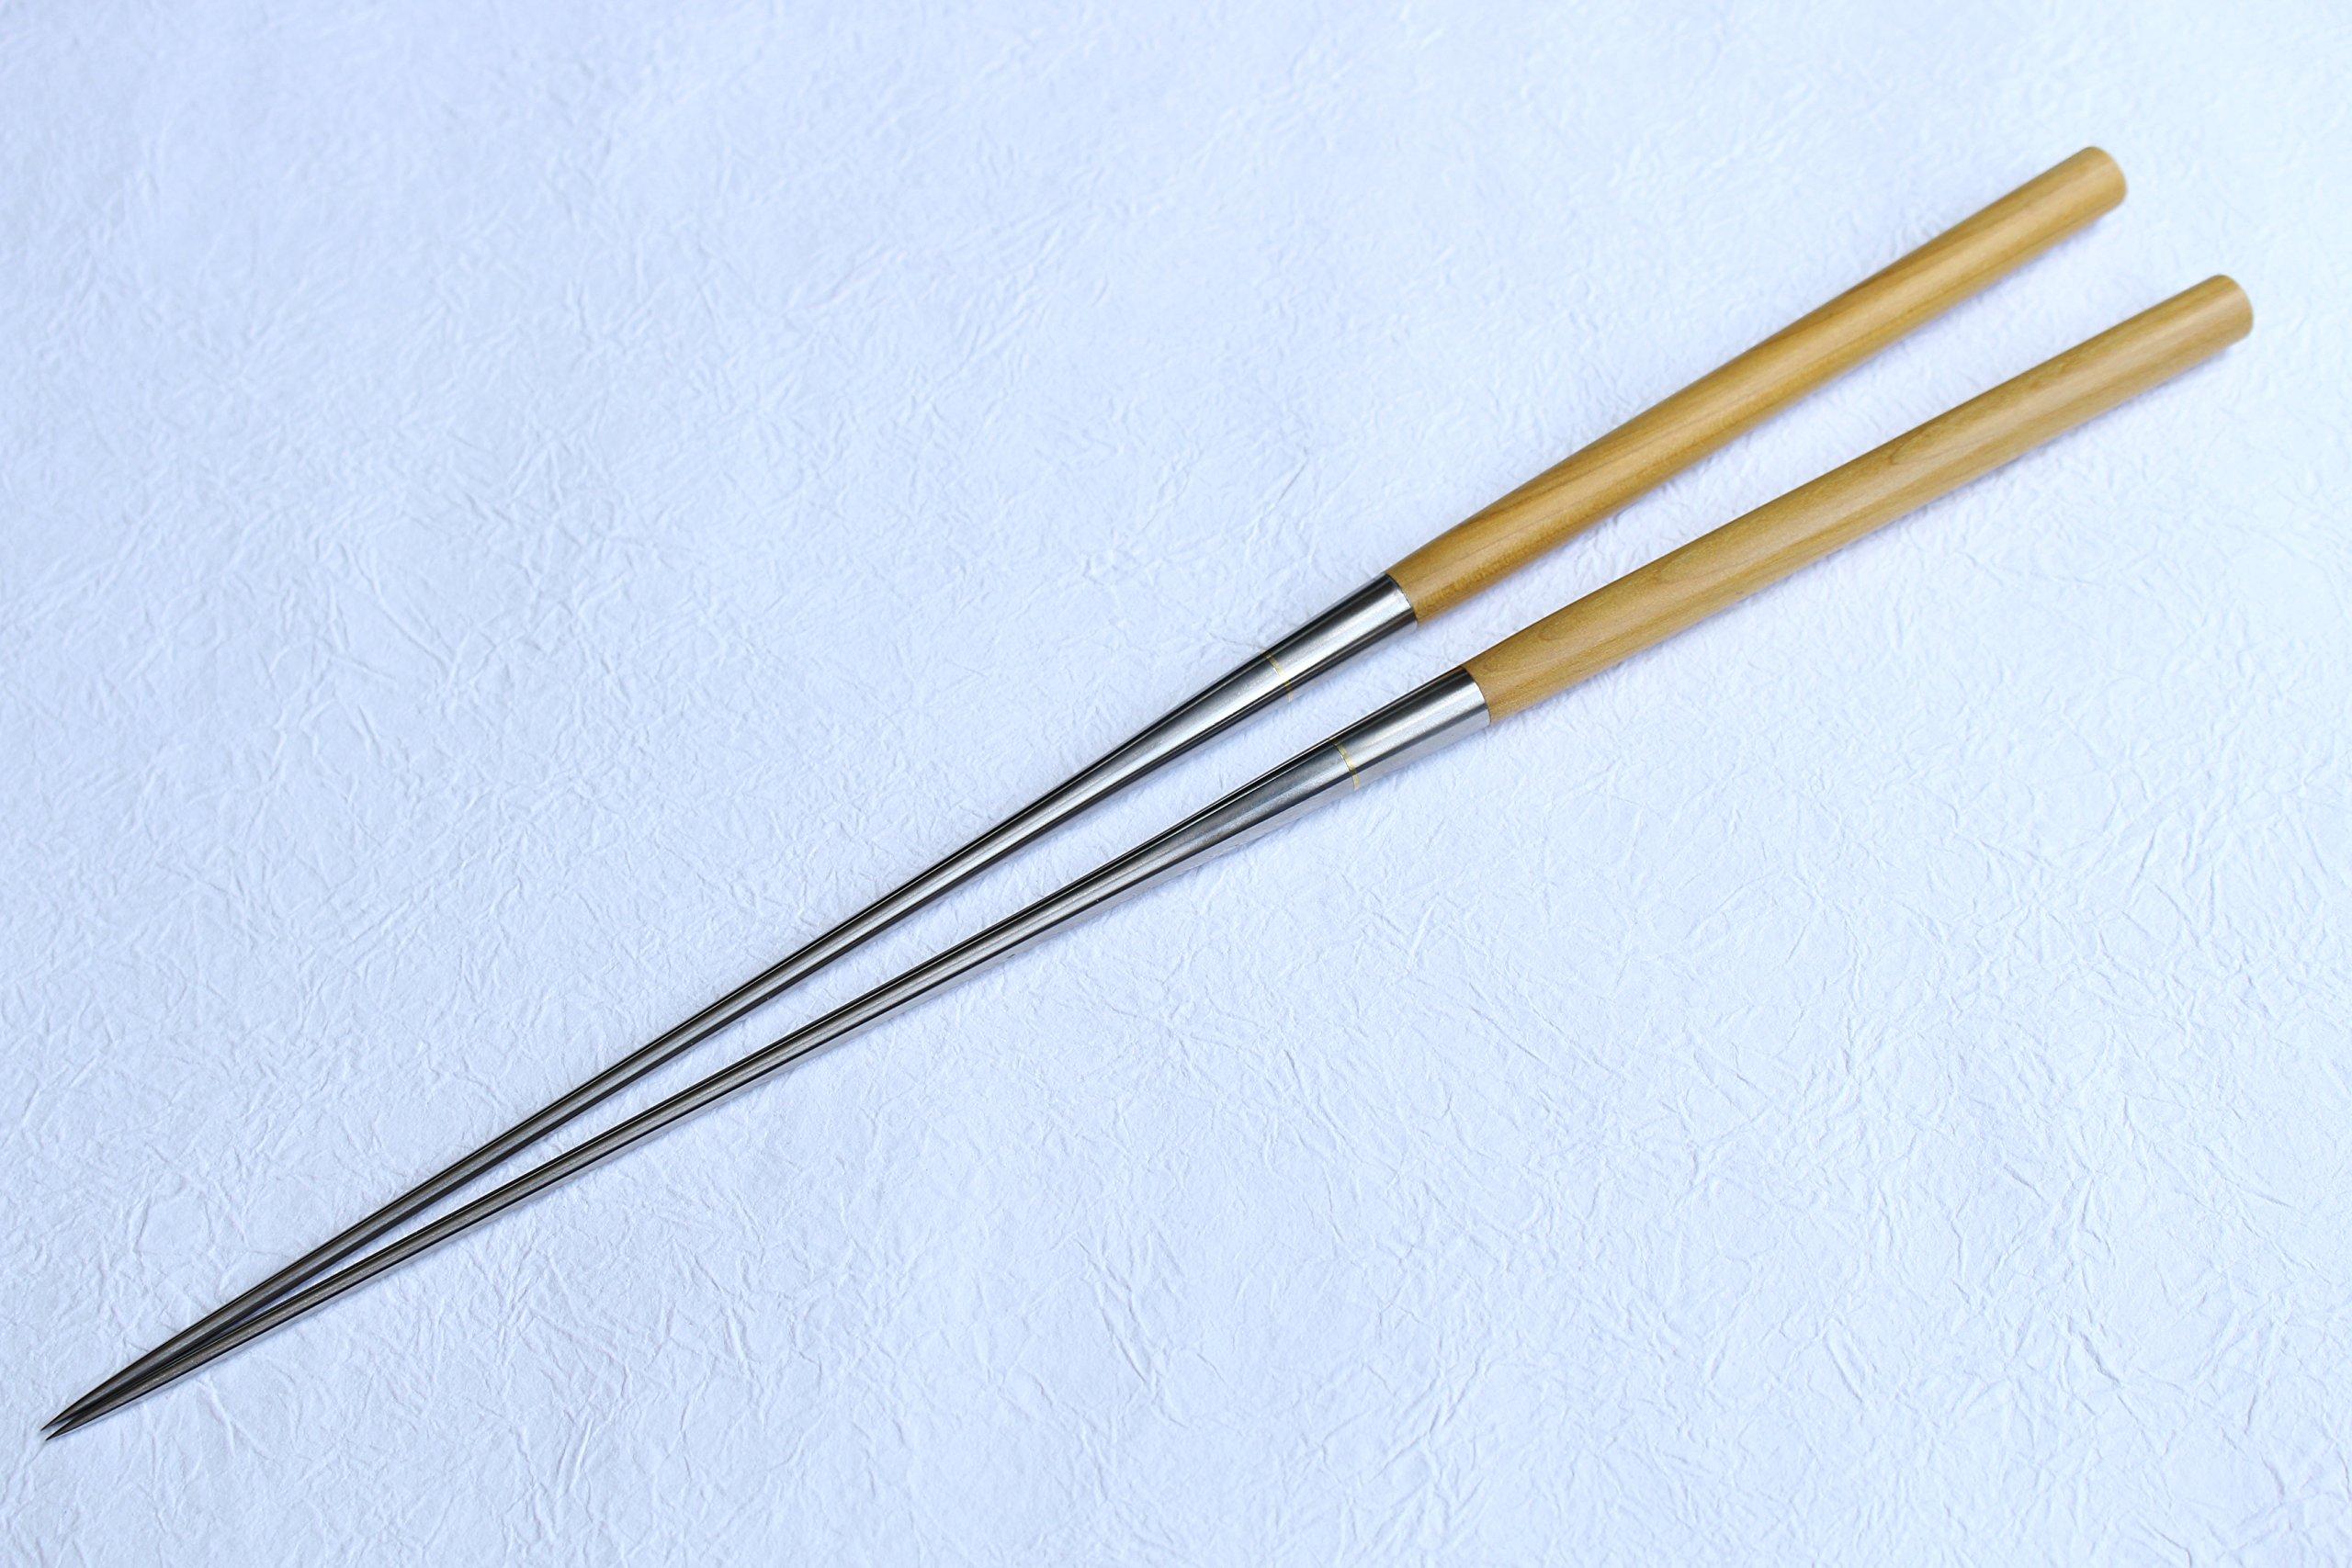 ibuki Yellowheart wood Moribashi Chopsticks Honyaki quenching stainless Japanese Sushi Chef's Garnishing 7.1 inch (180mm) by ibuki (Image #1)